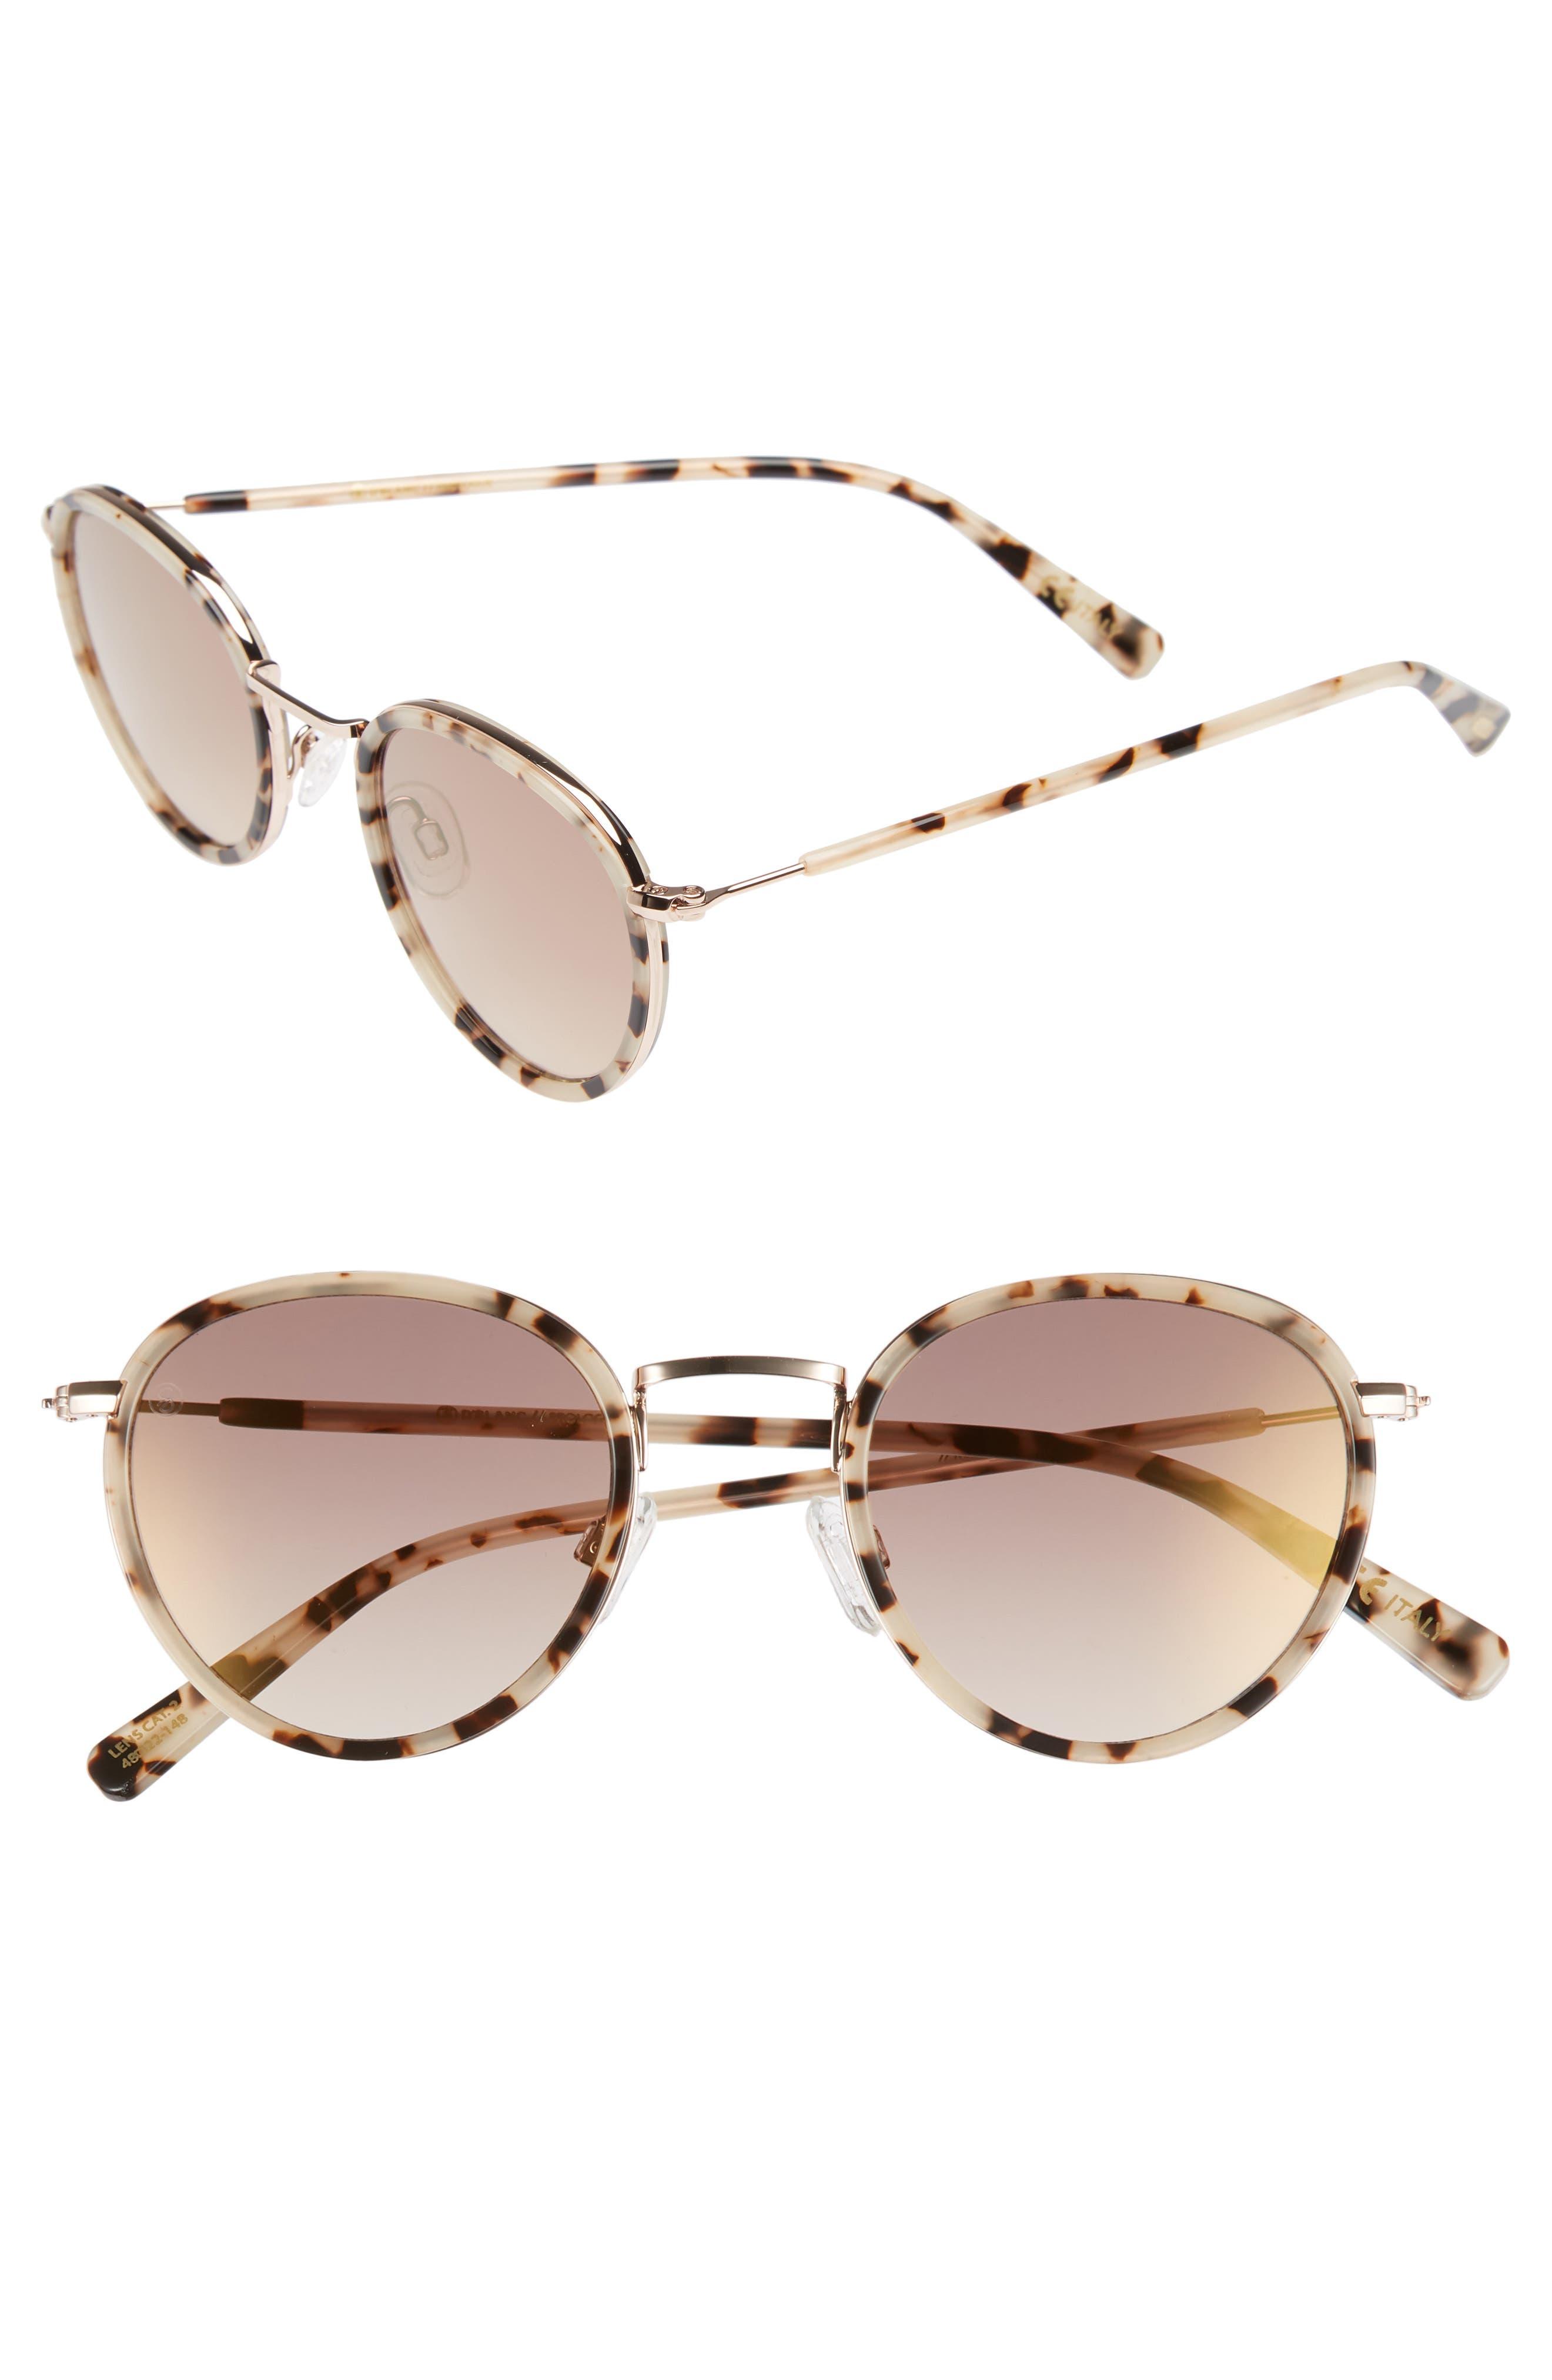 D'BLANC Prologue 48mm Round Sunglasses,                         Main,                         color, 200